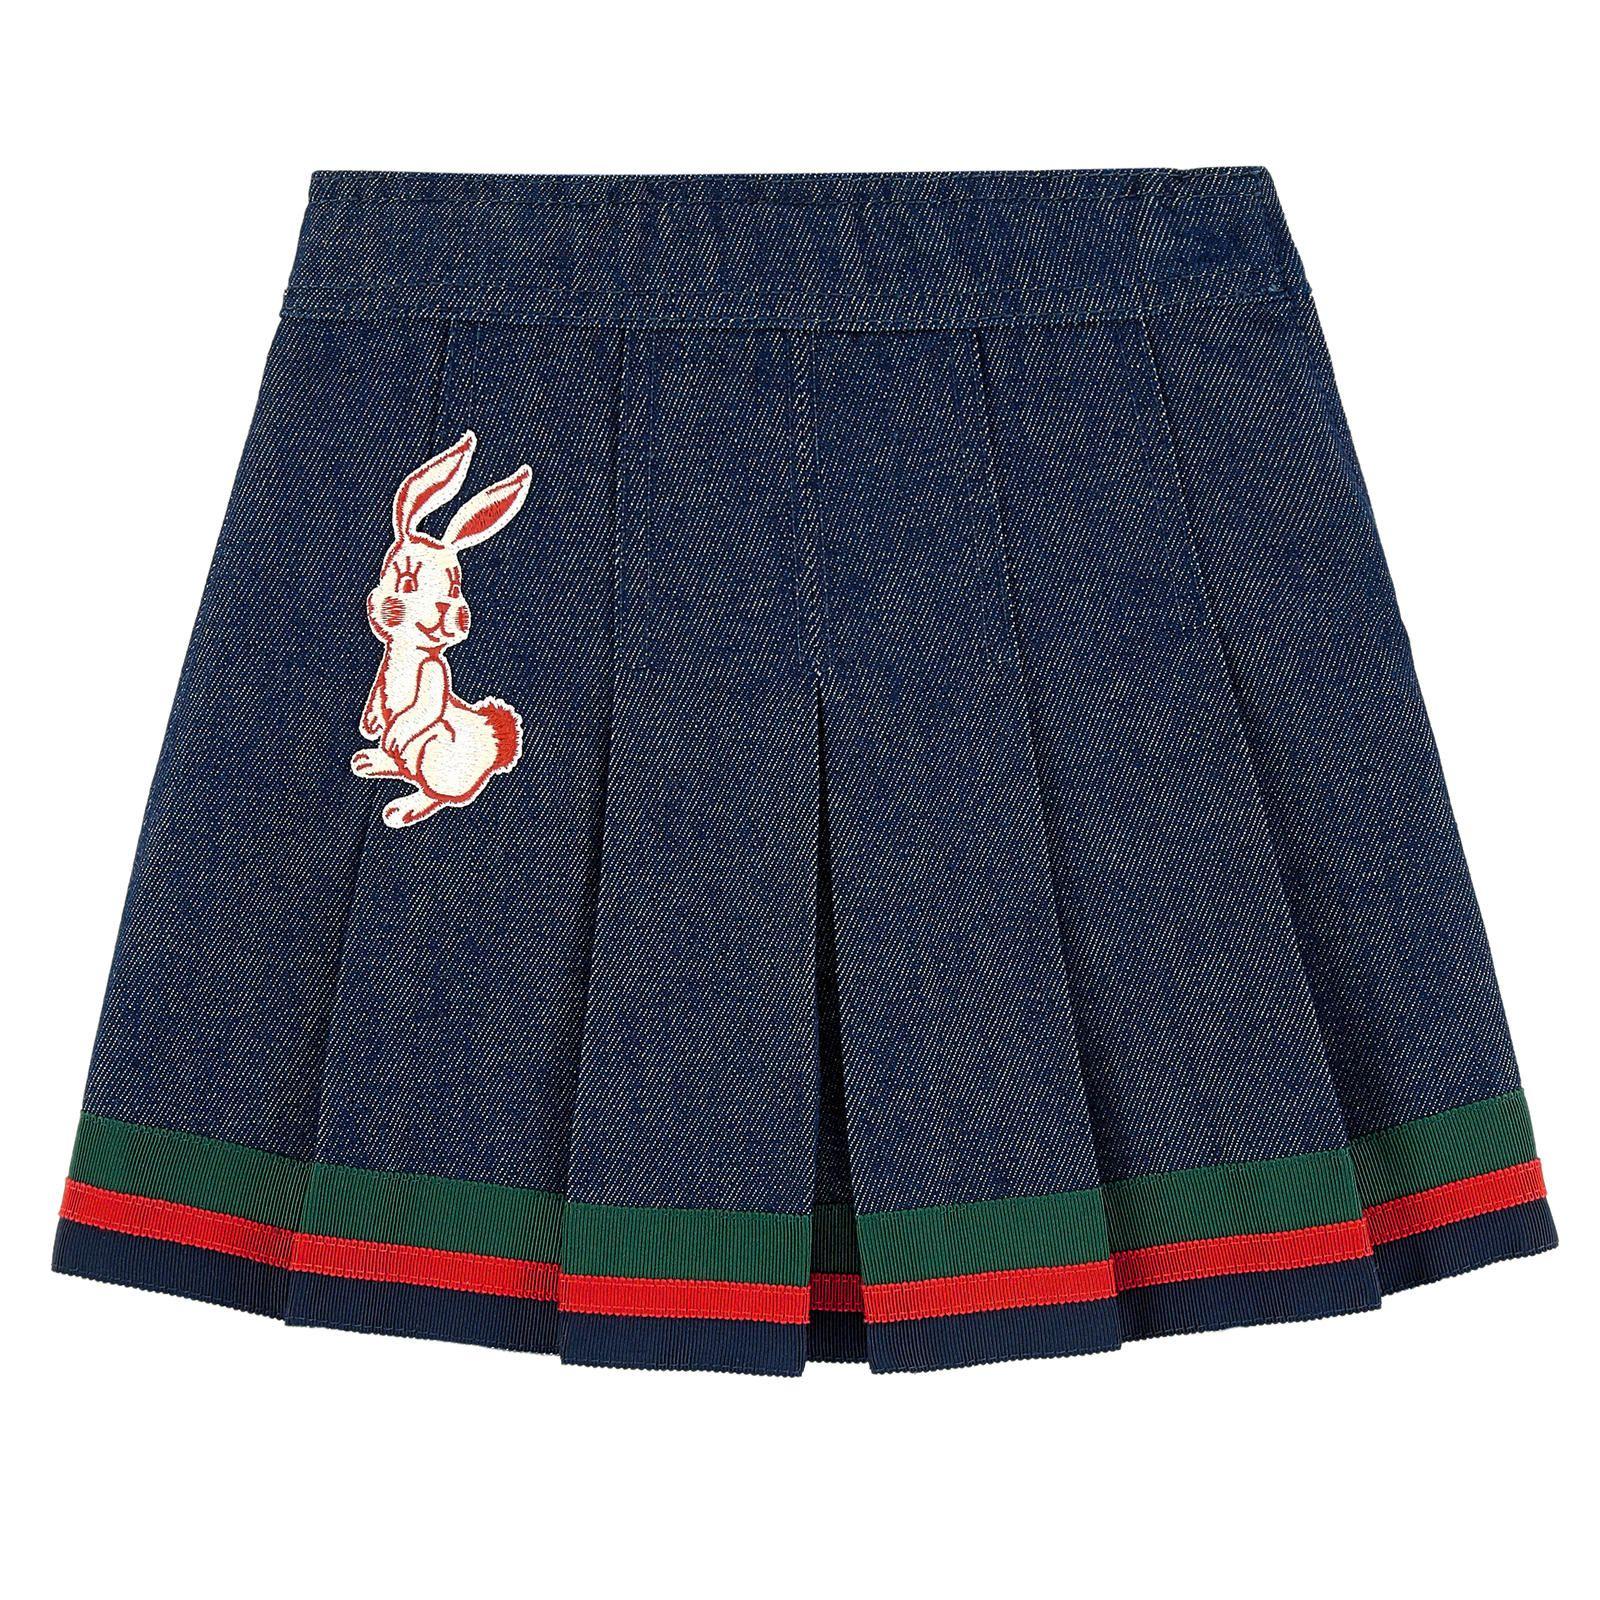 0d40e80d0d7 Gucci Kids T-Shirt 479395X3G89 (Little Kids Big Kids) at Luxury.Zappos.com